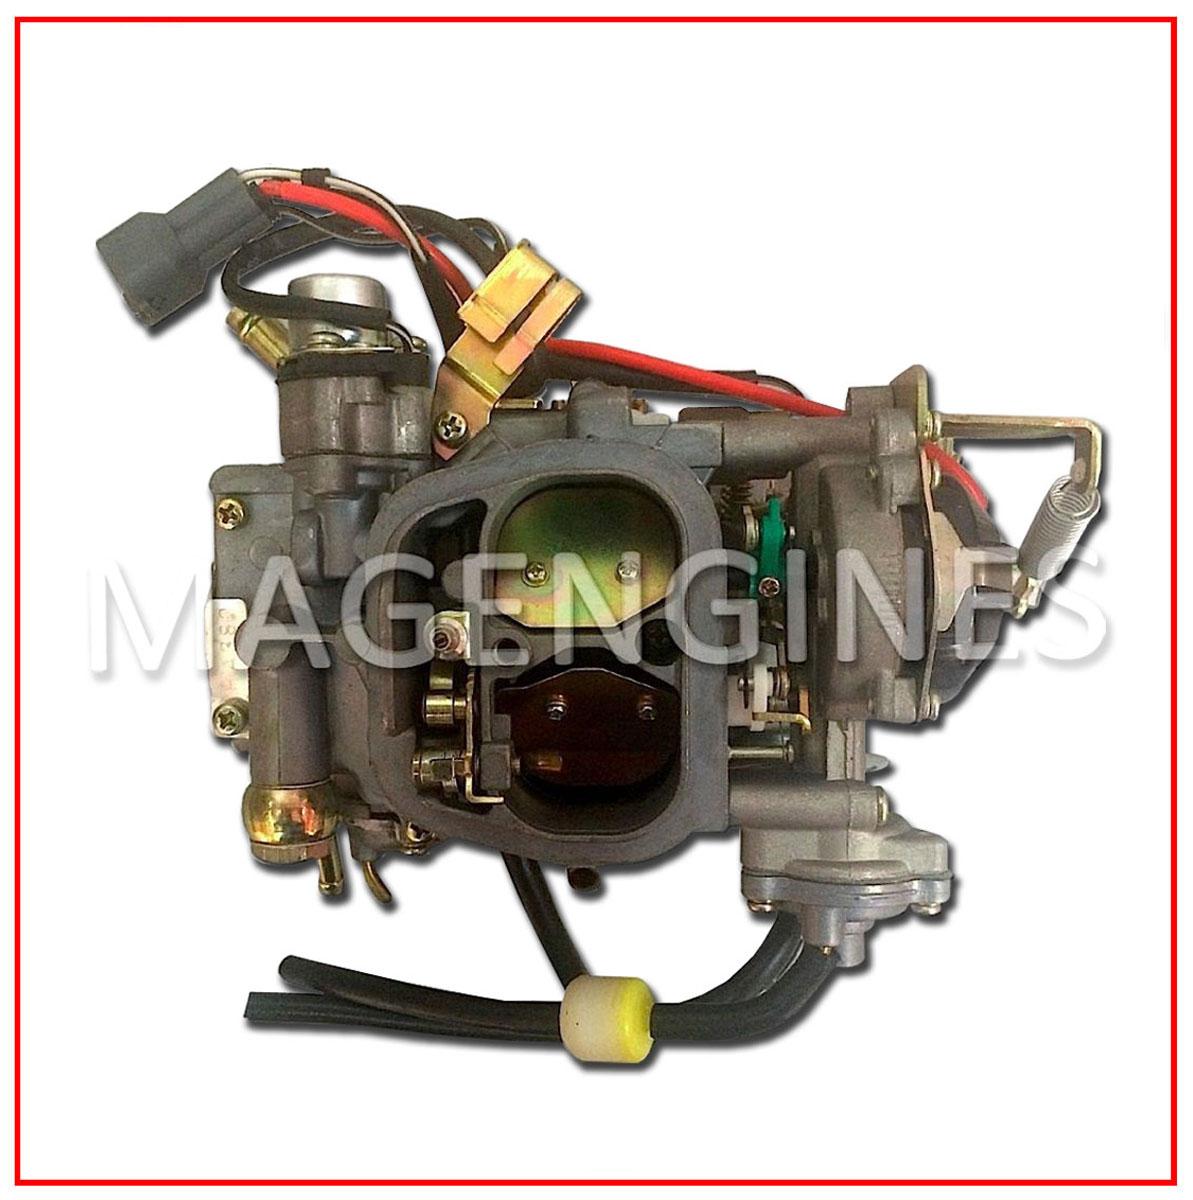 hight resolution of 22r carburetor